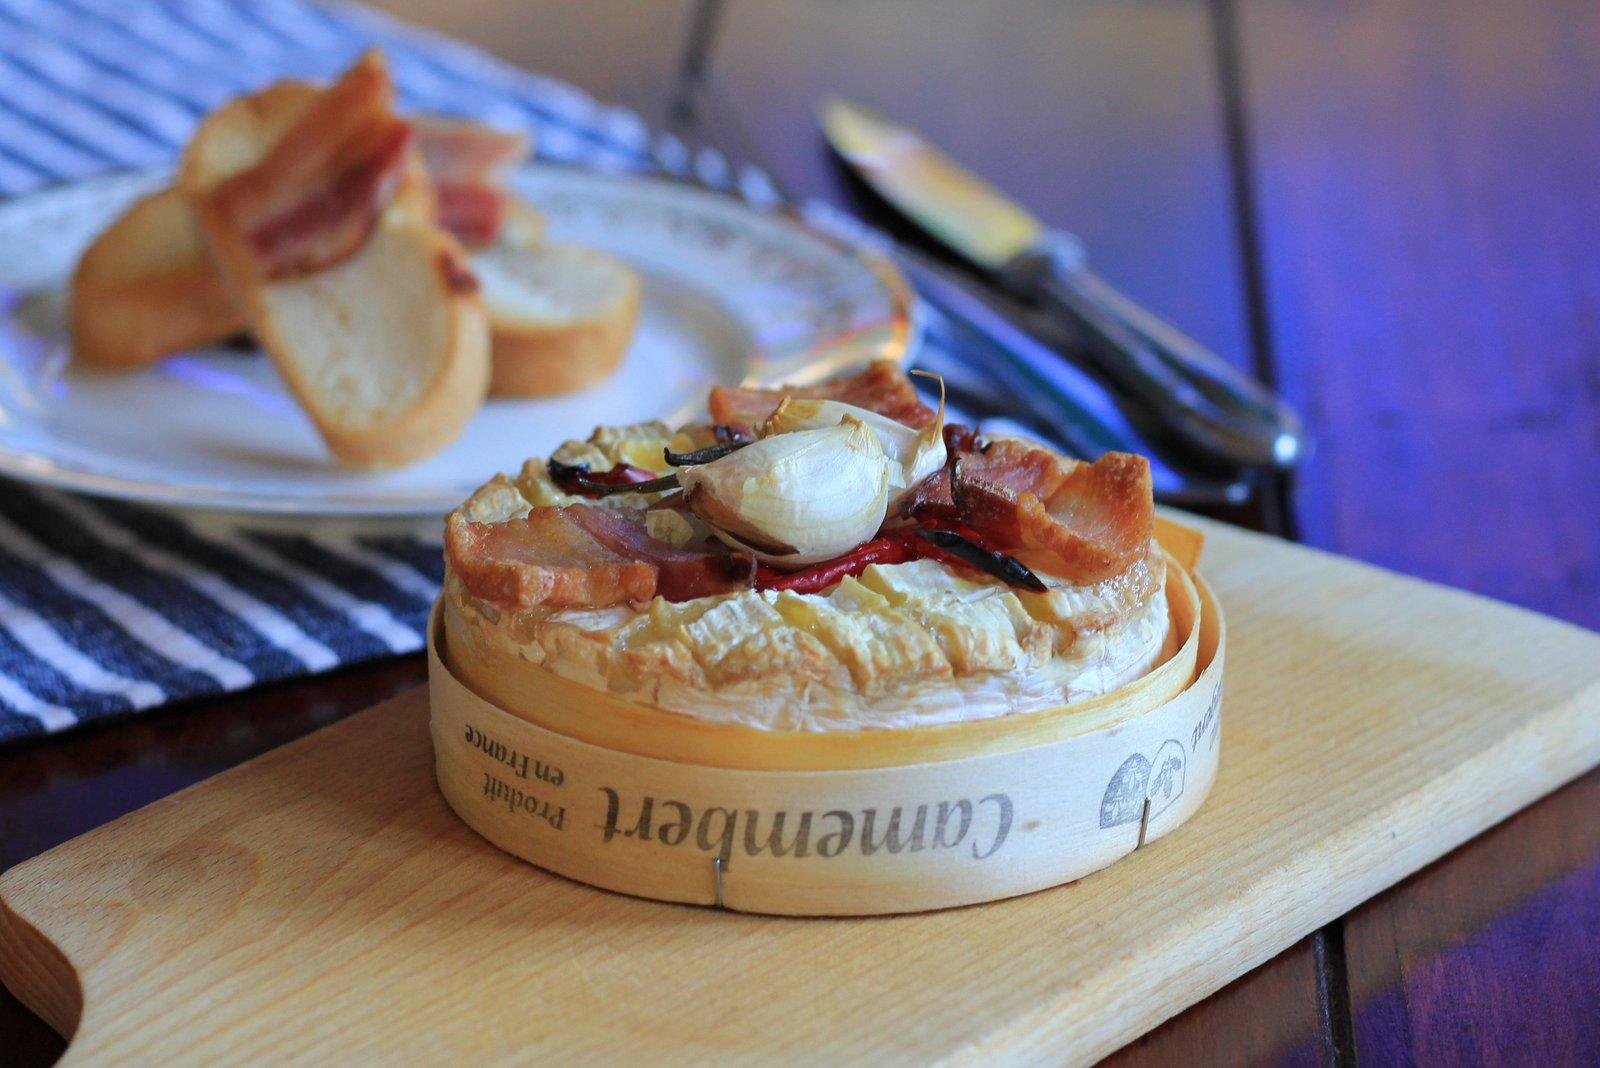 tak trochu francuzska vecera, grilovany camembert